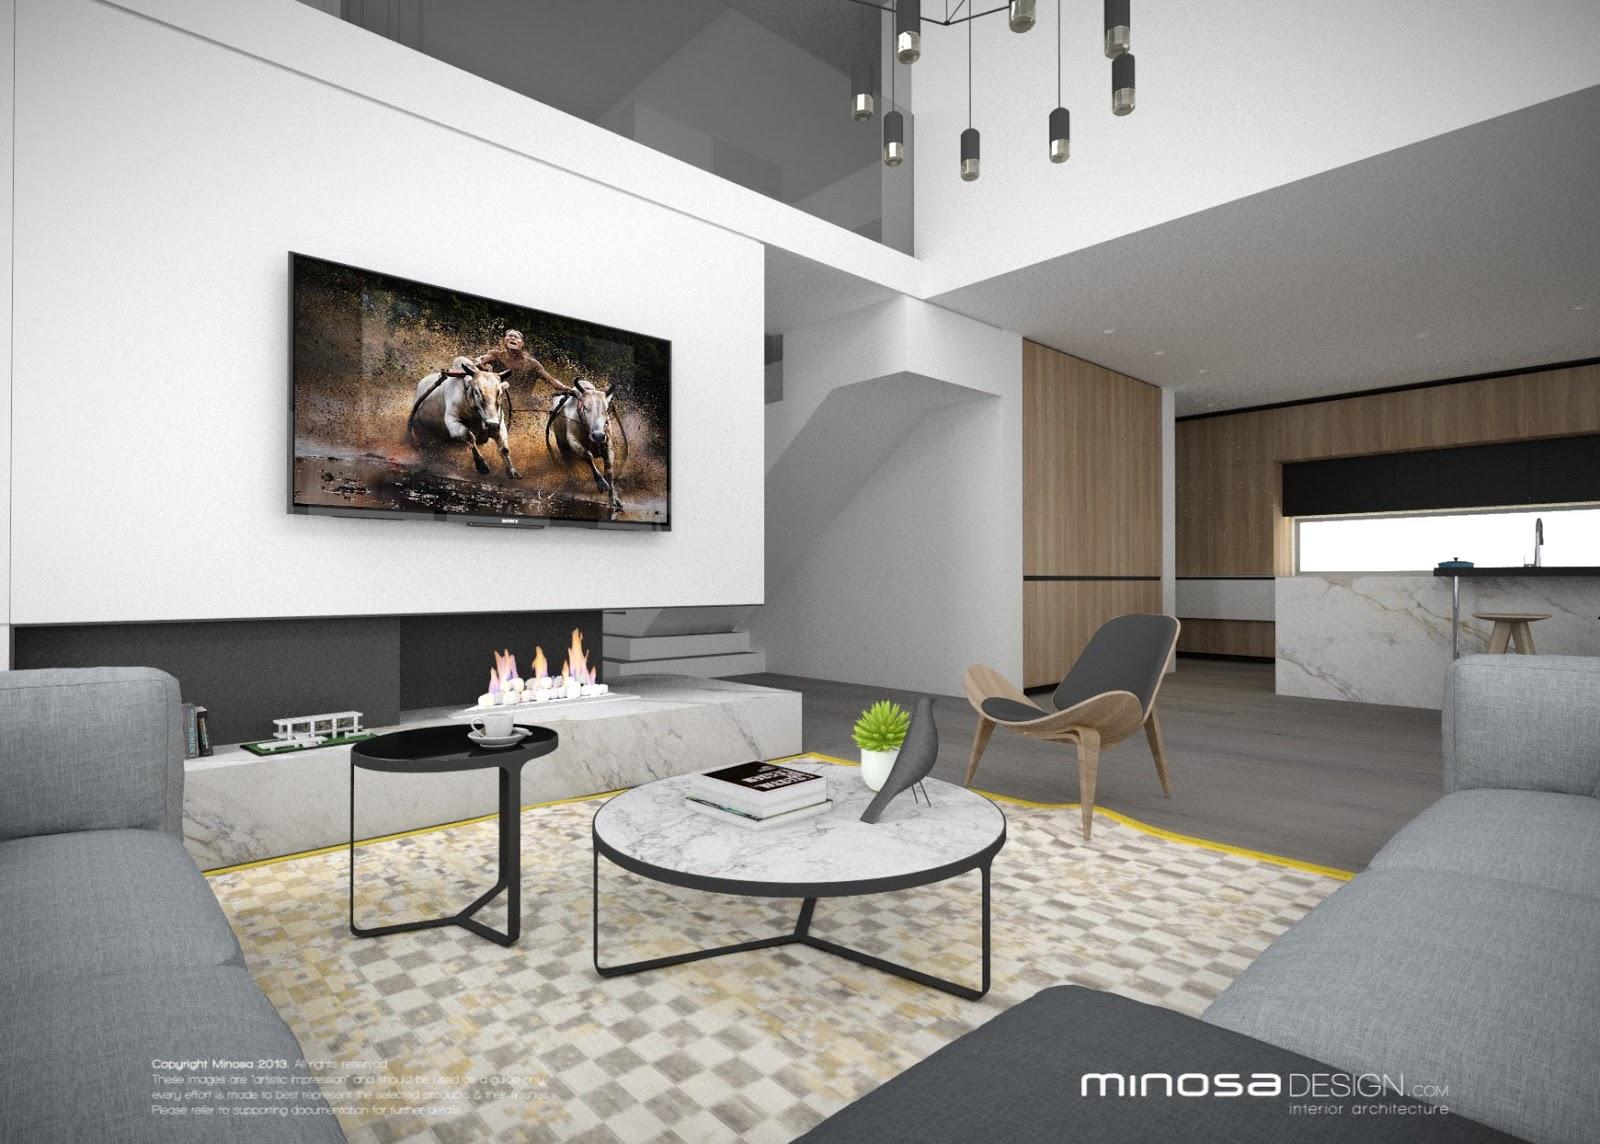 Minosa: The Modern Living Room